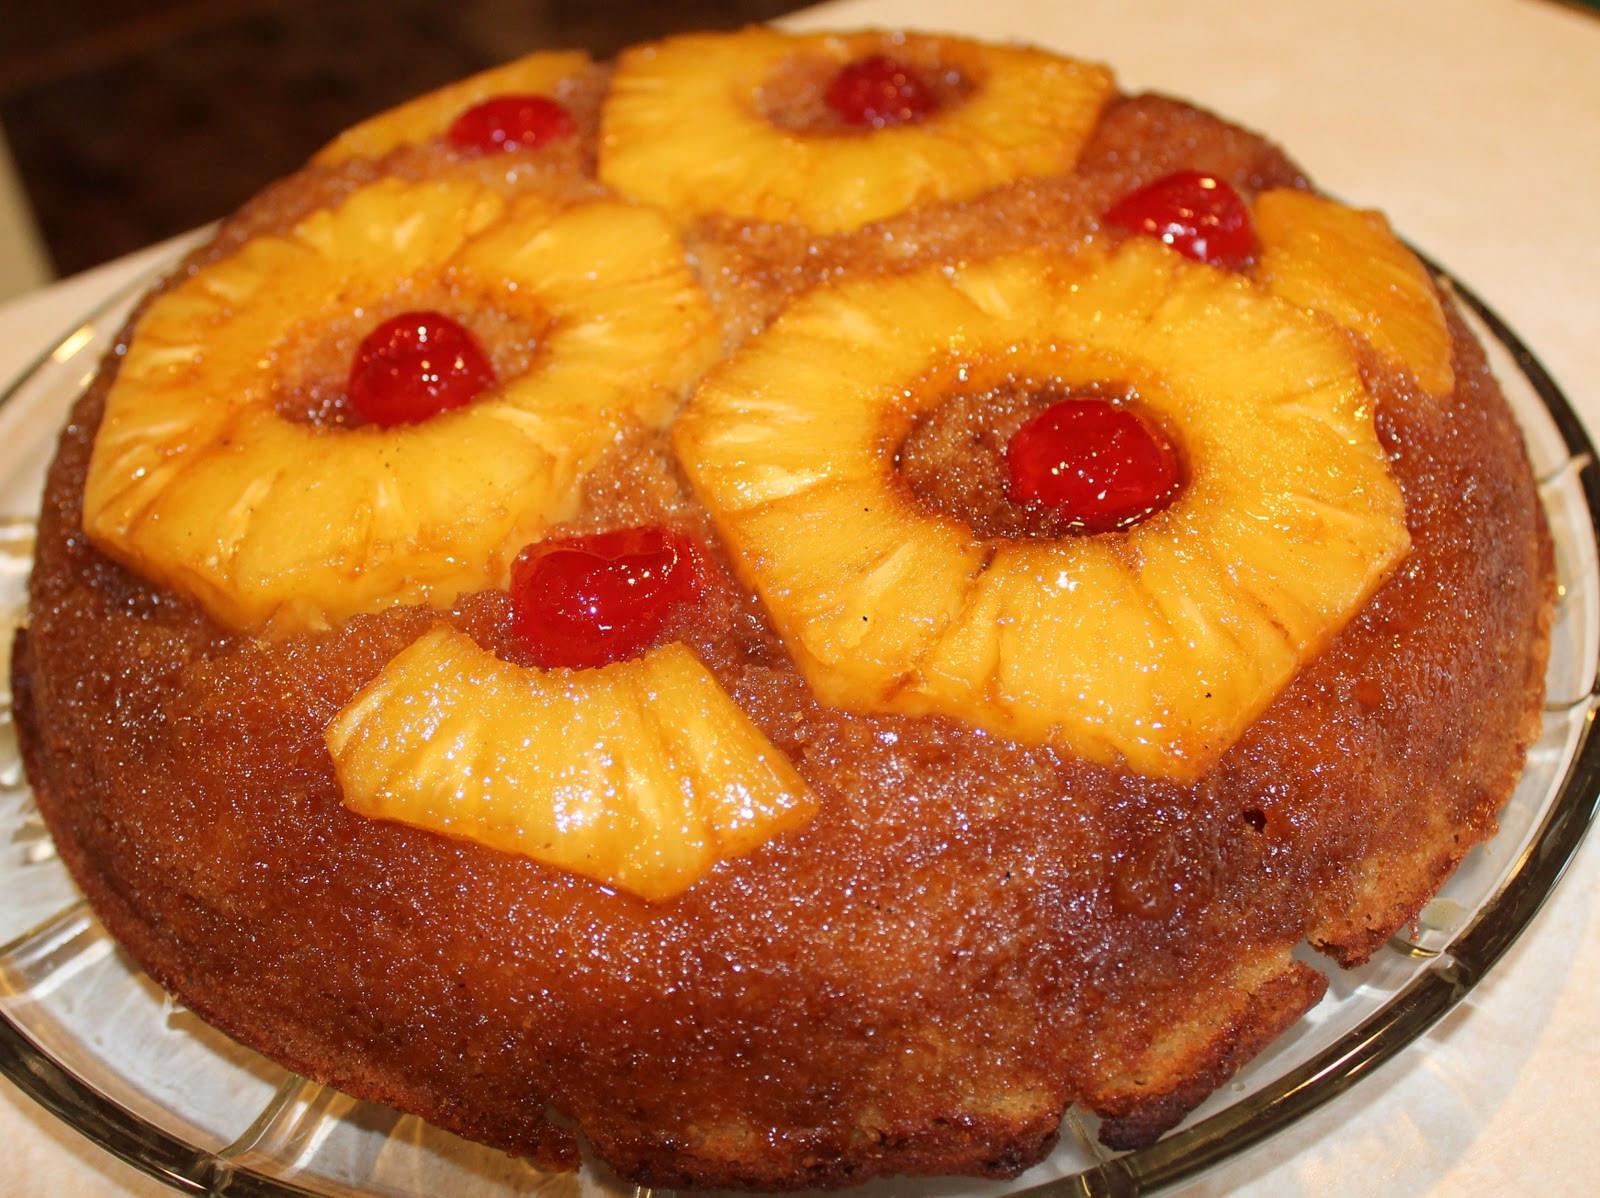 Skillet Pineapple Upside Down Cake  Skillet Pineapple Upside Down Cake Just e Donna